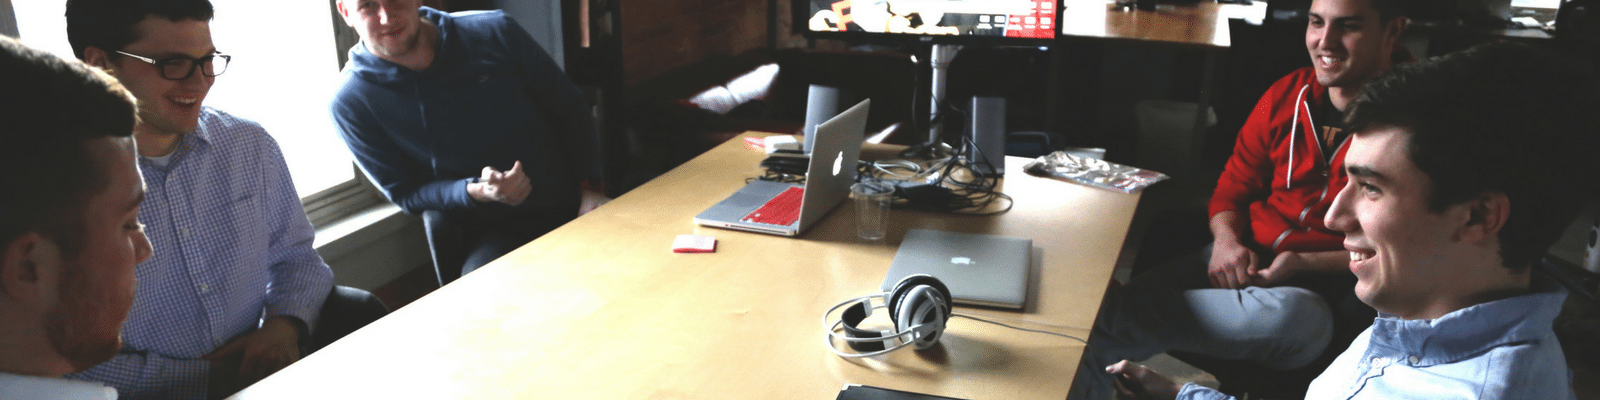 technology desk